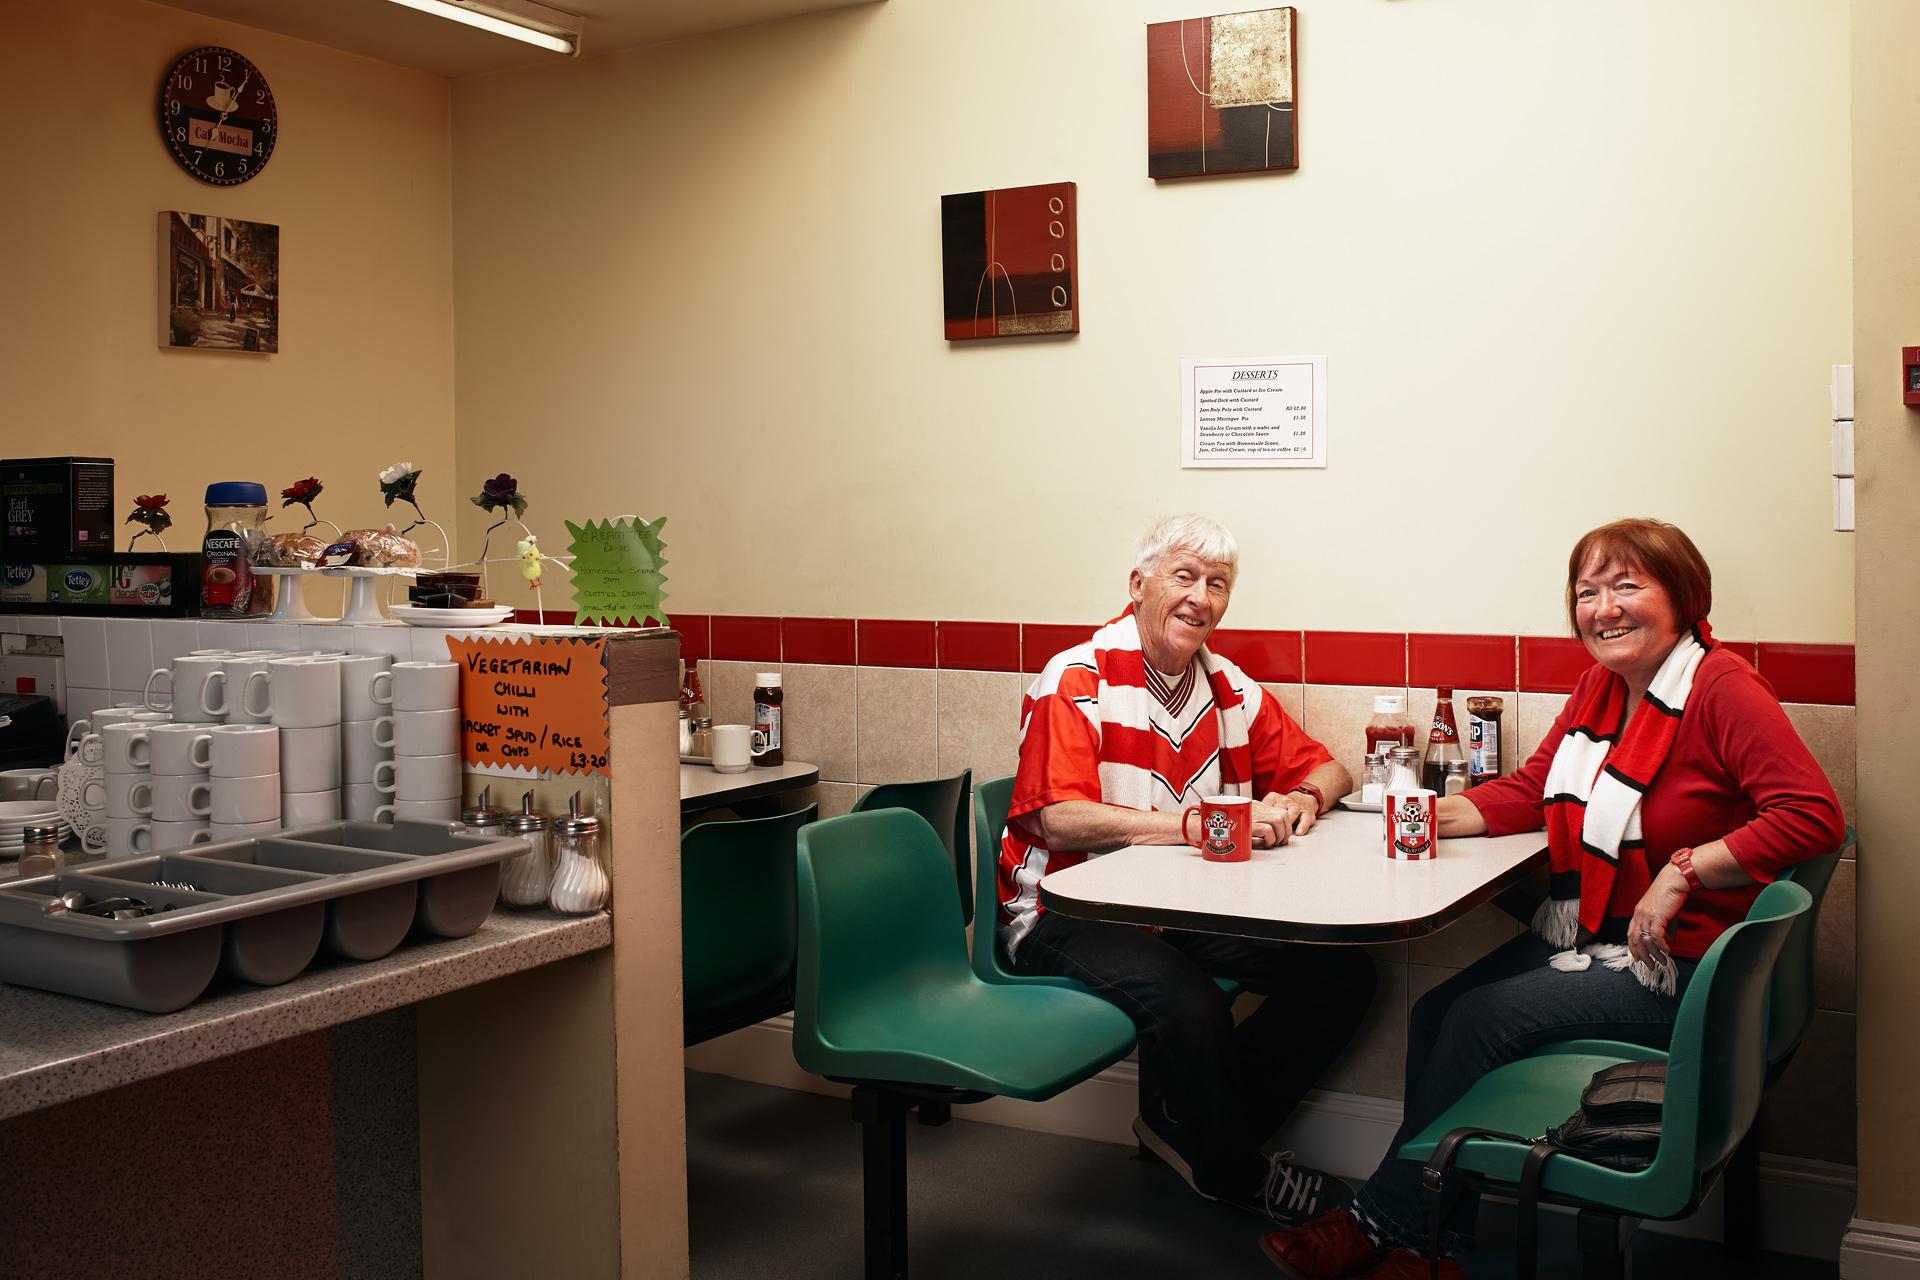 Southampton_Cafe